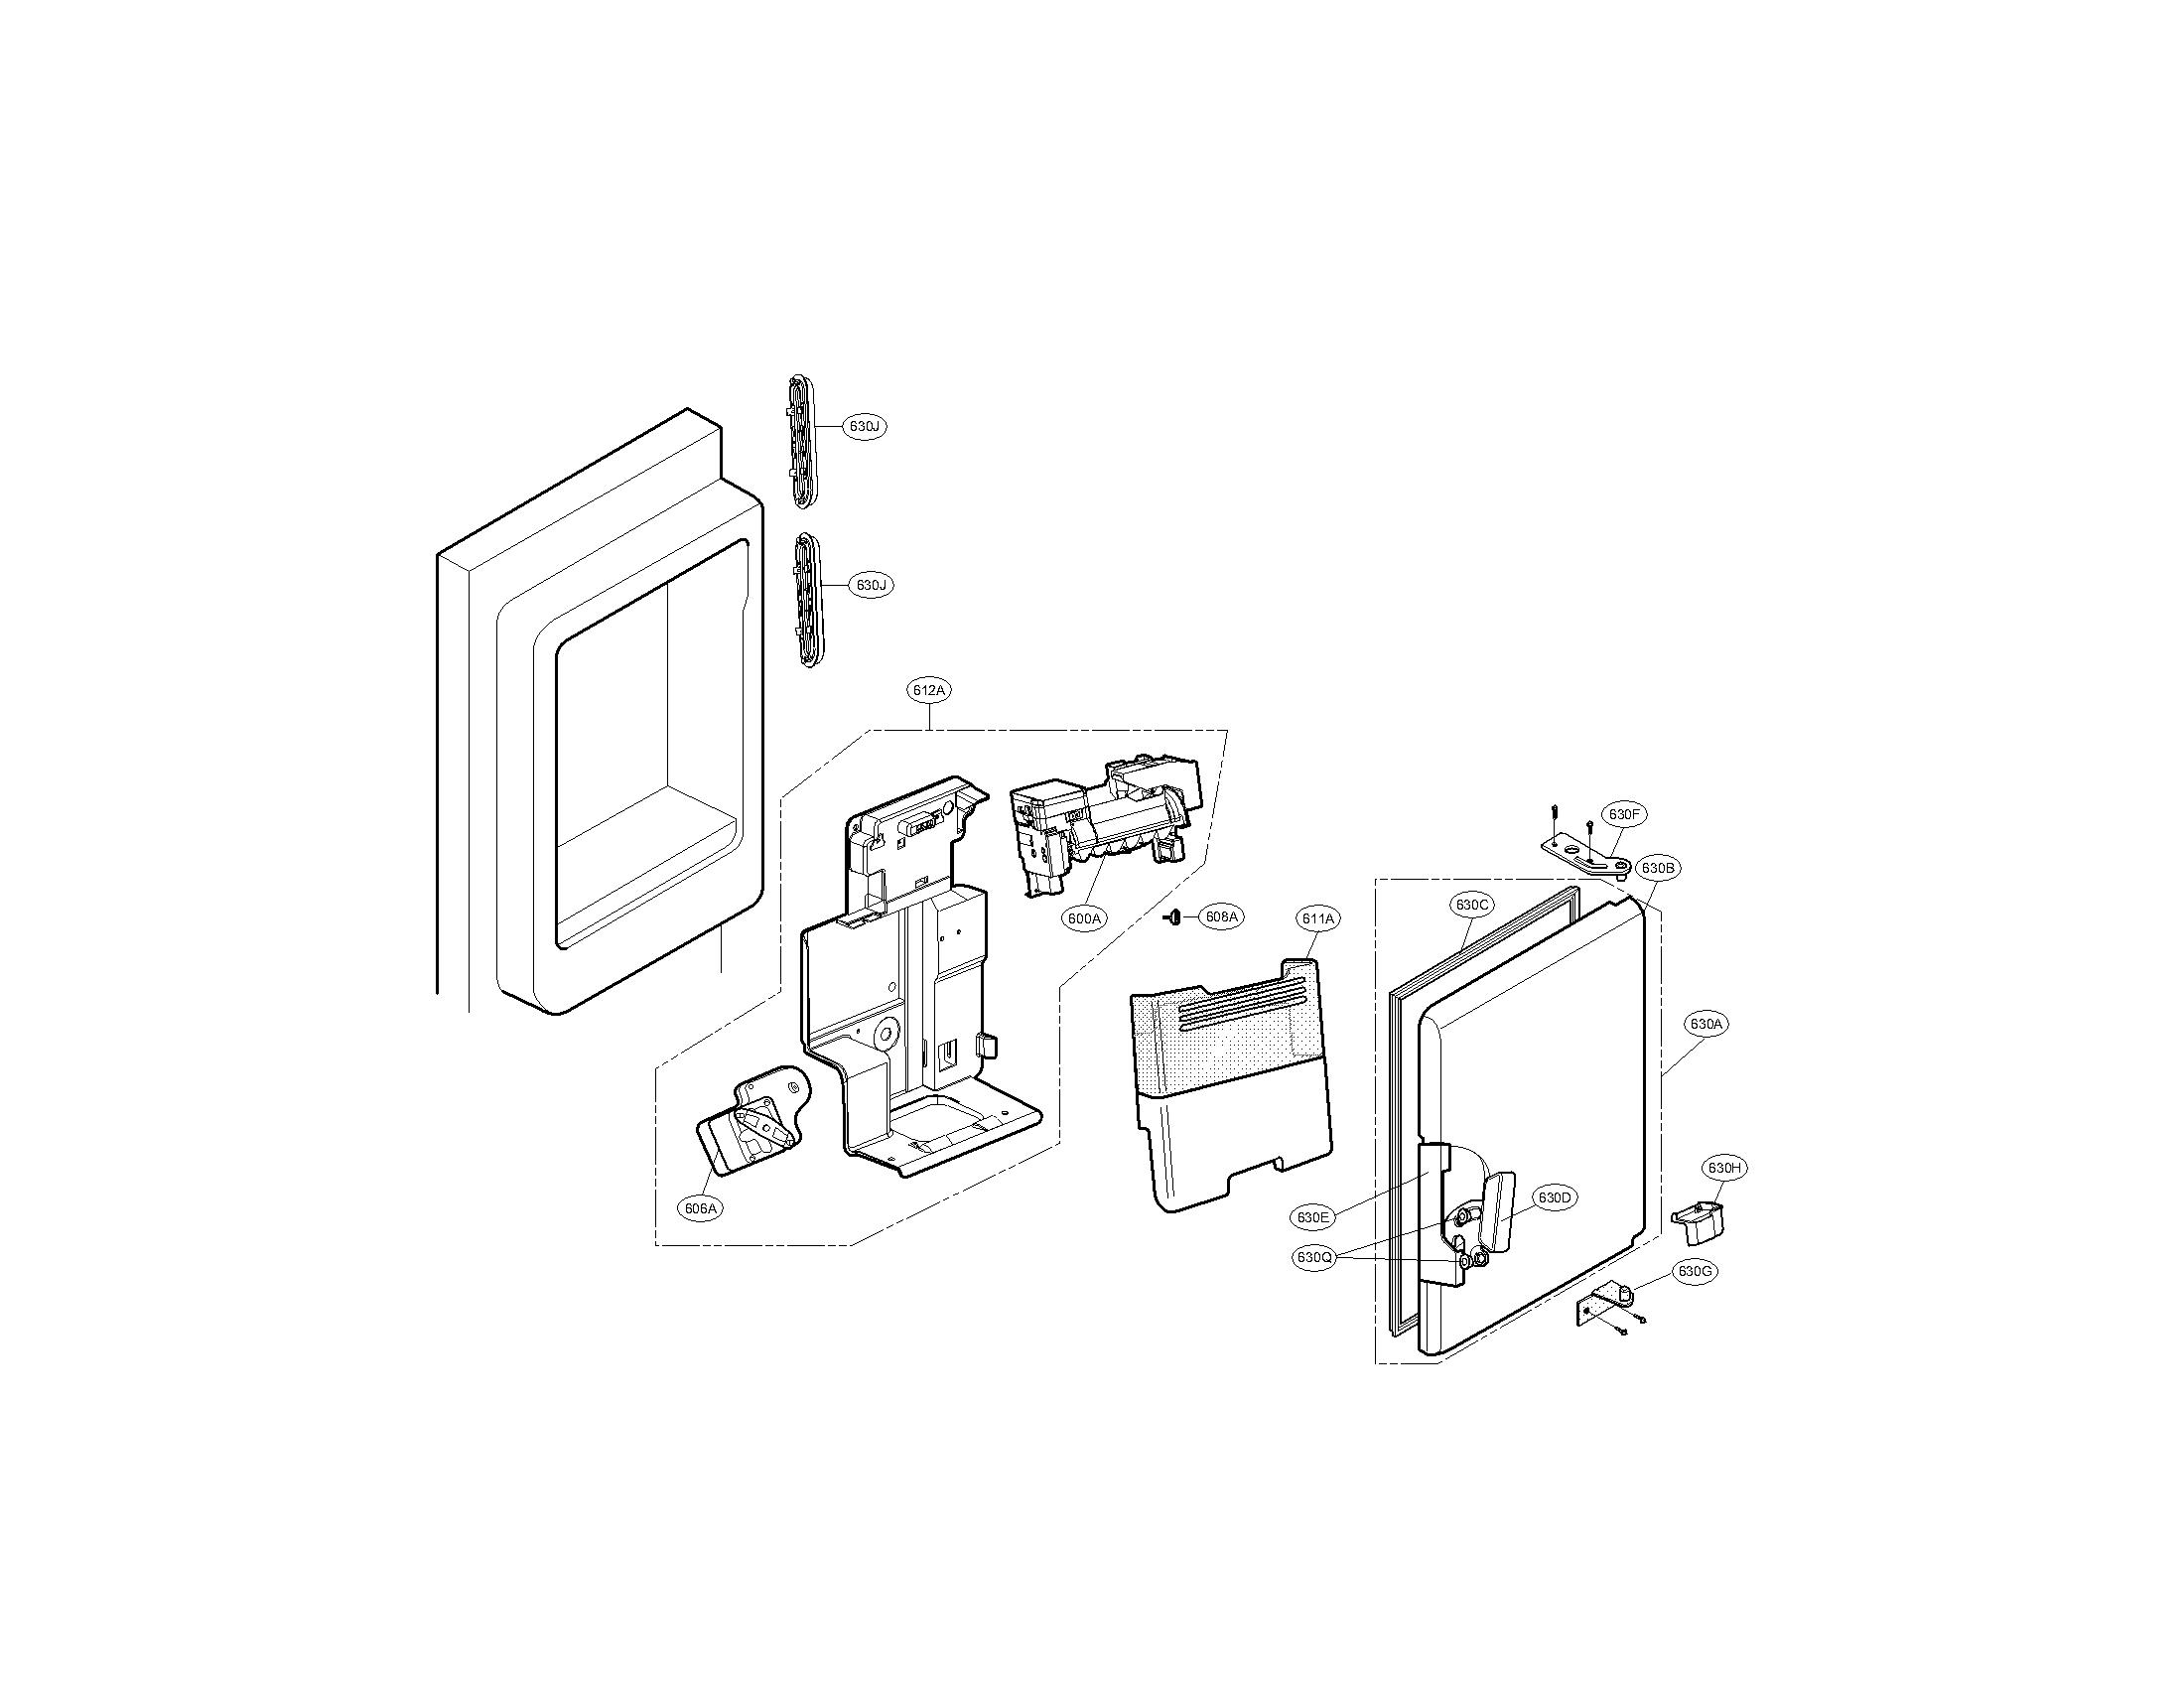 Kenmore elite refrigerator model 795 manual